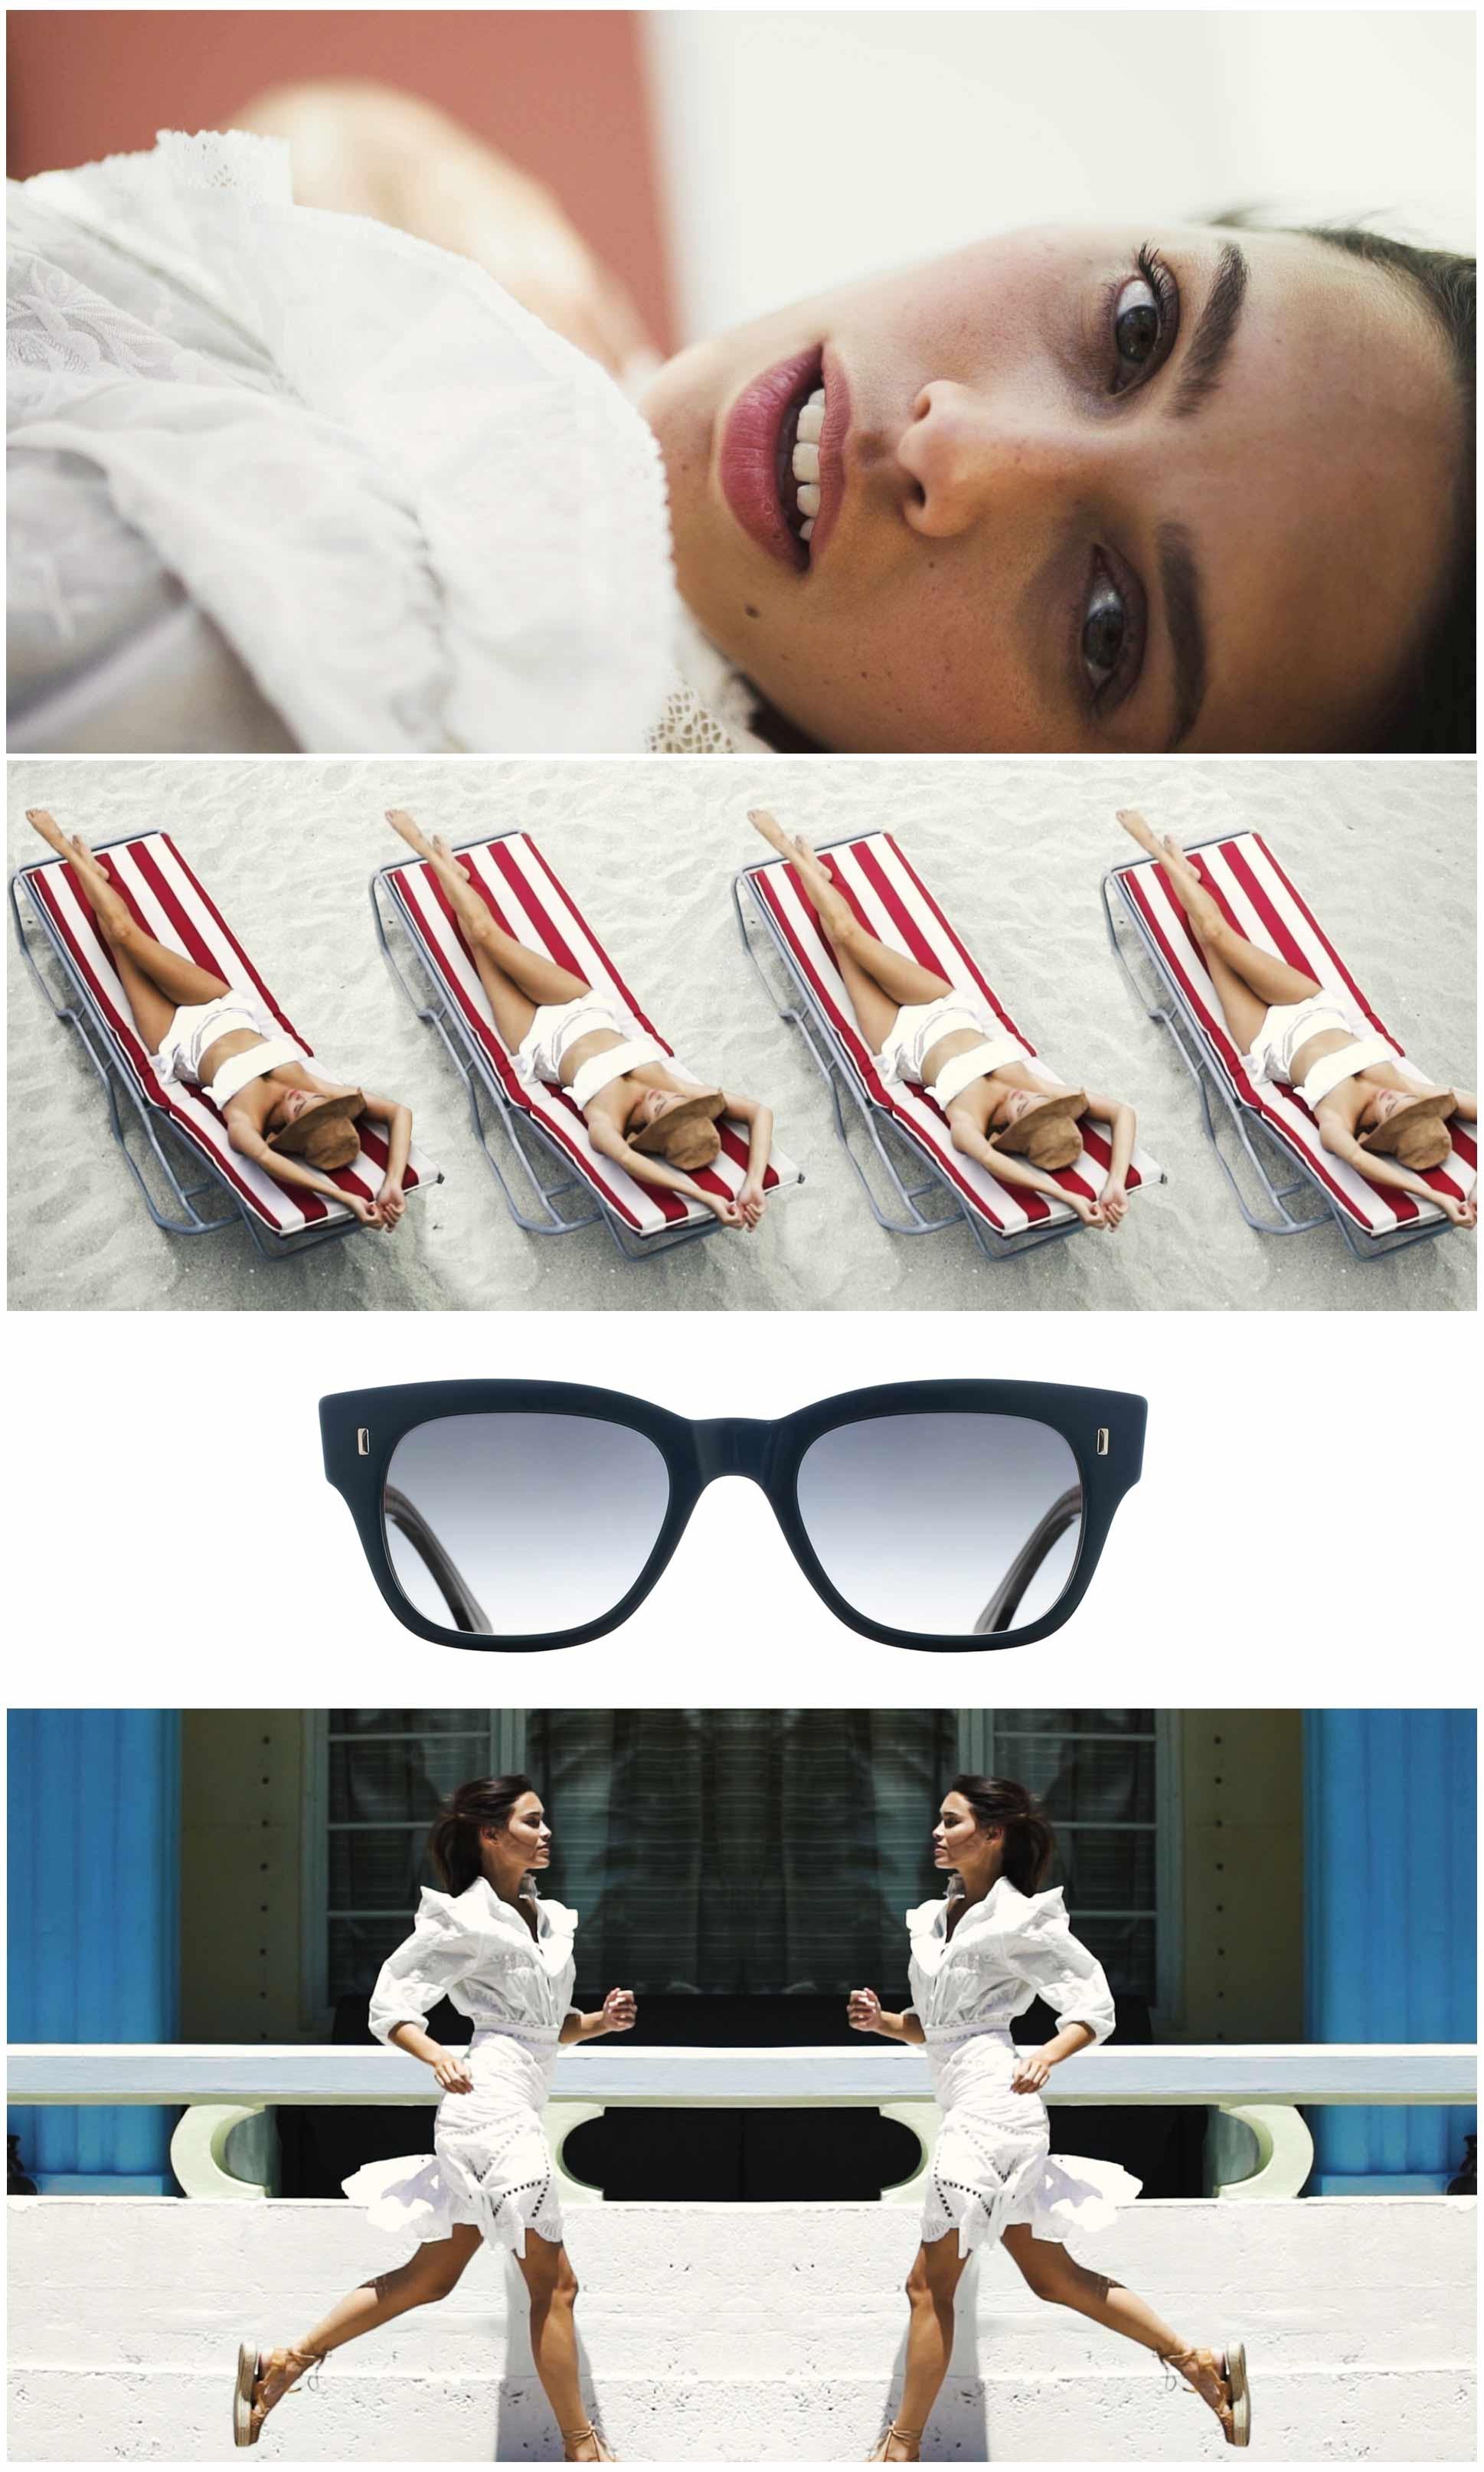 The Miami Sunglasses campaign images